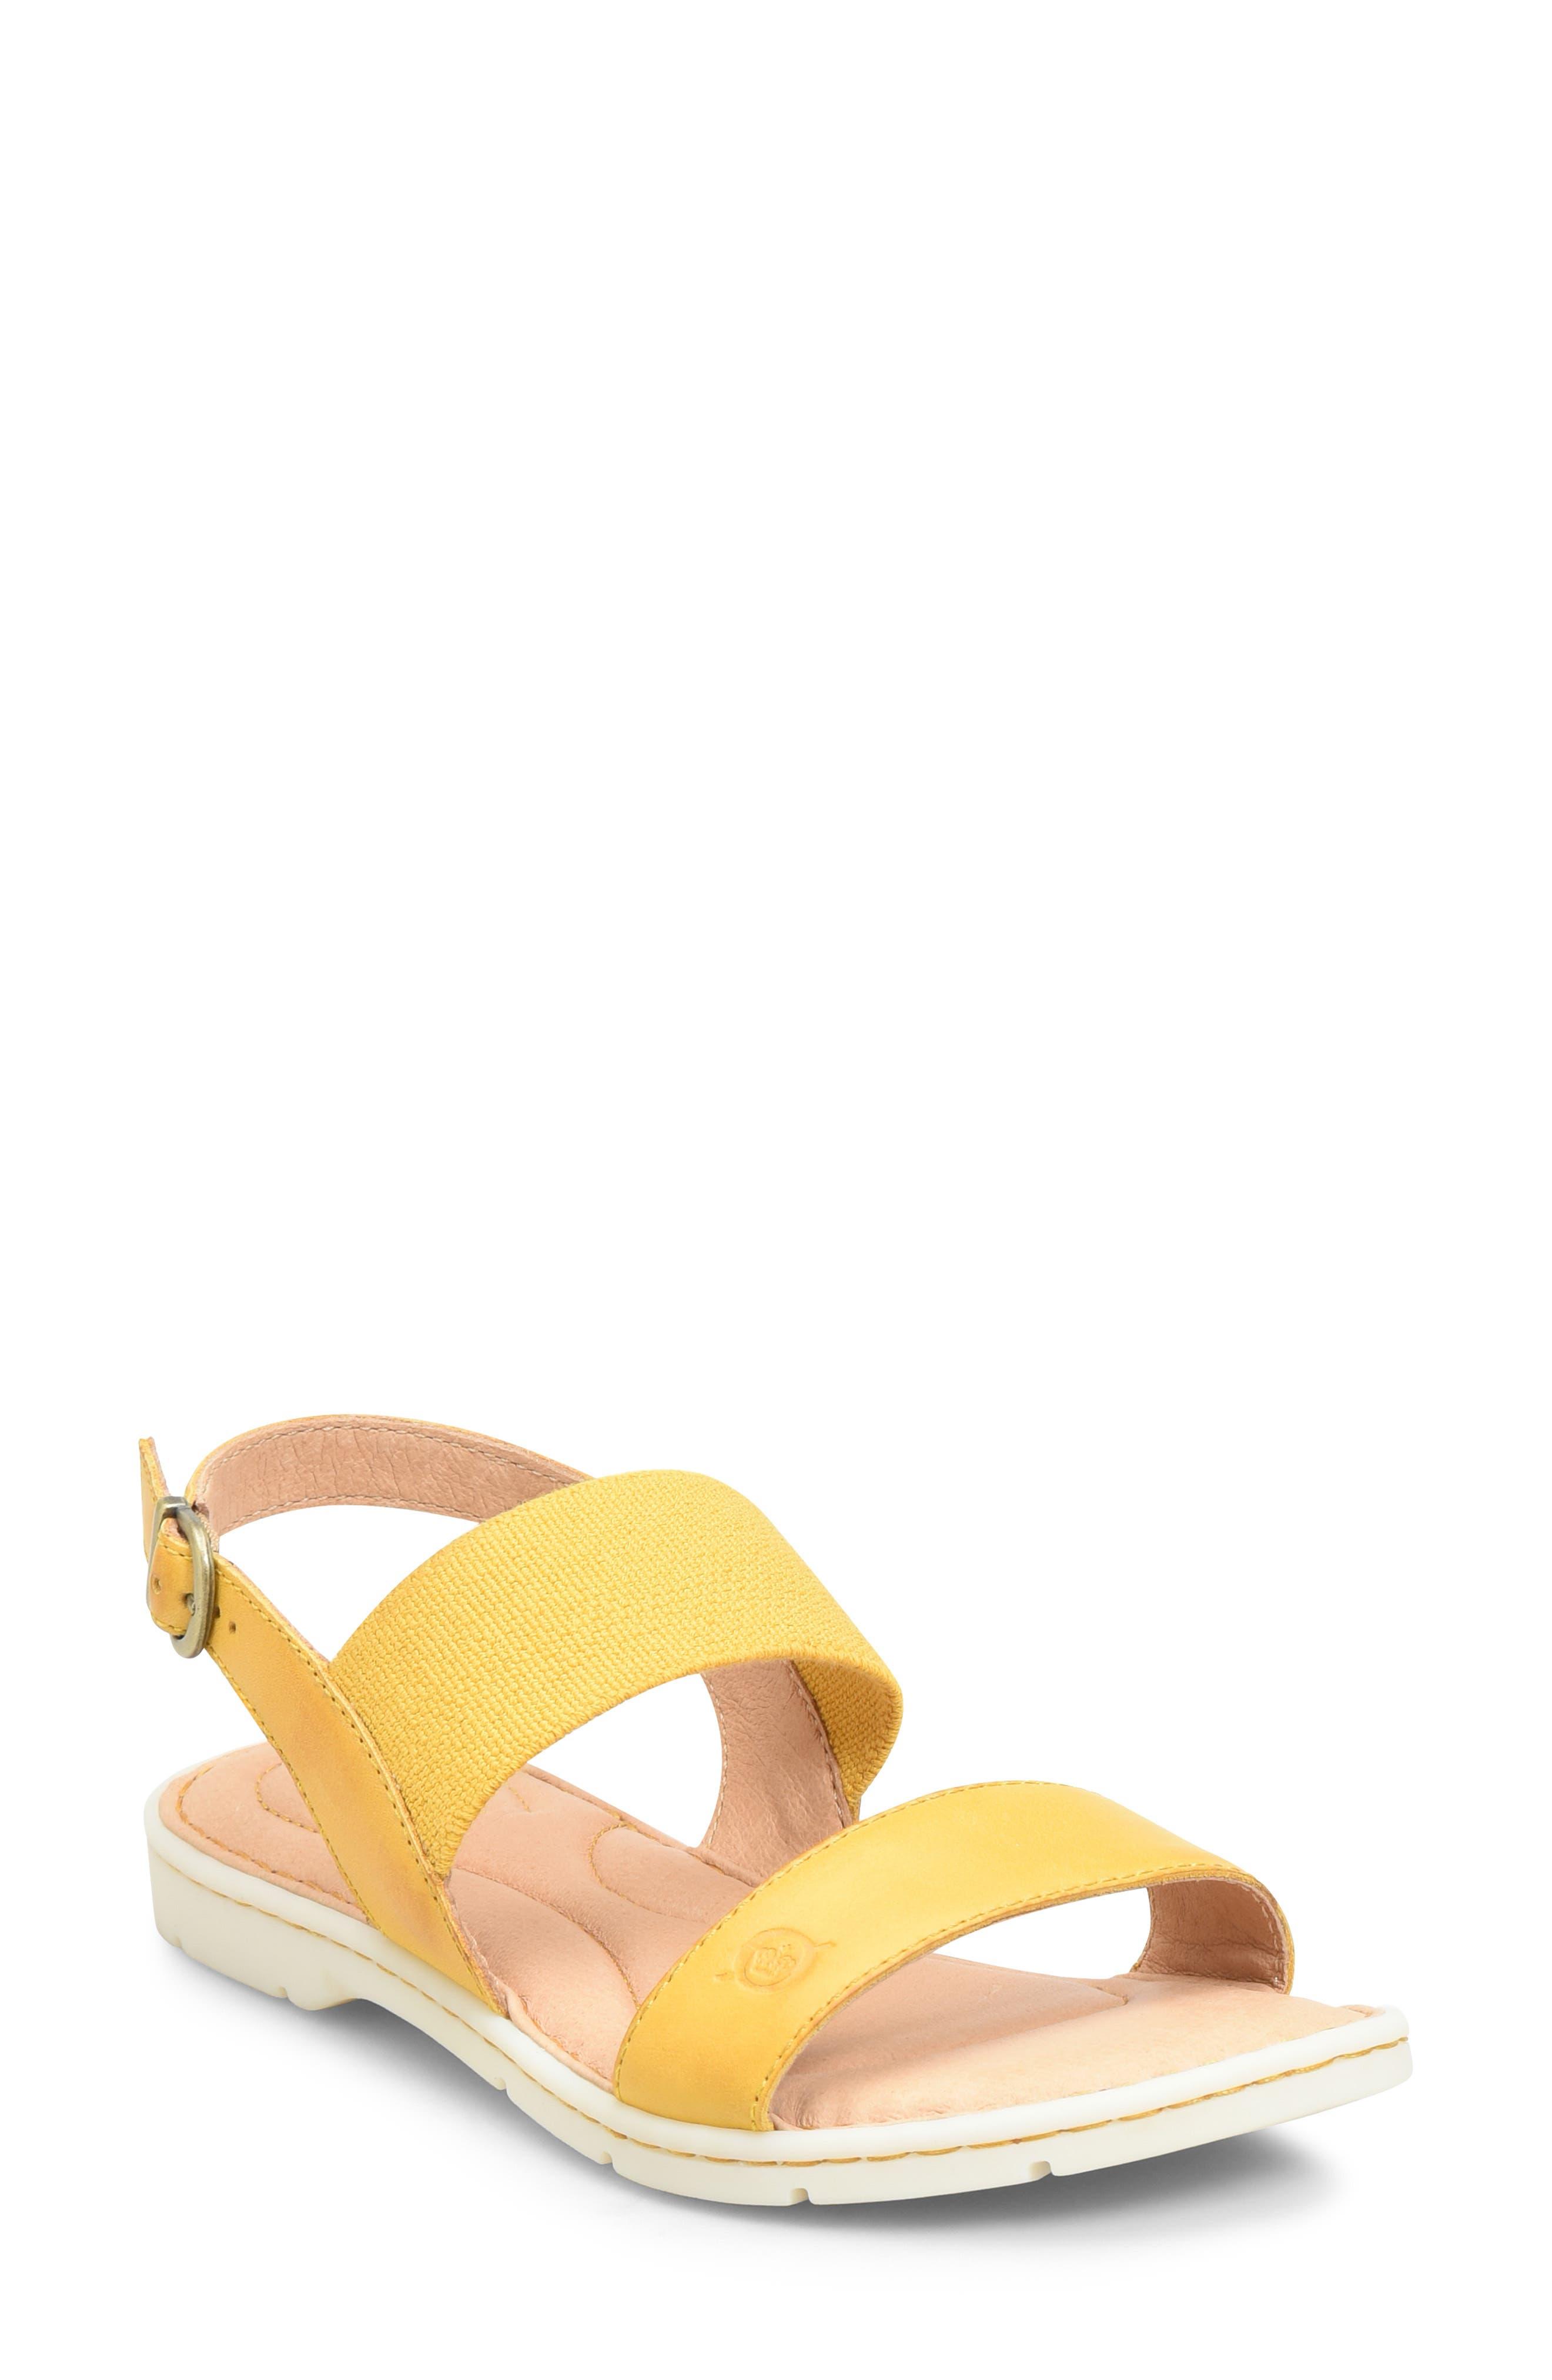 B?rn Tusayan Sandal, Yellow